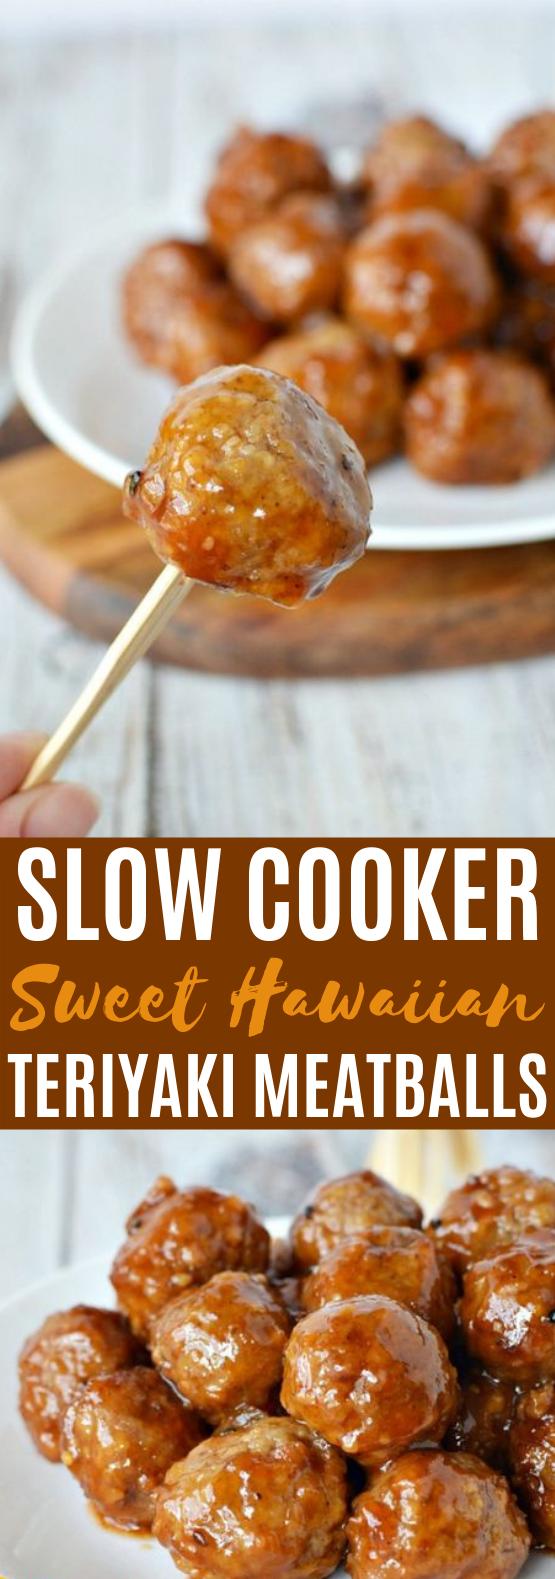 Slow Cooker Sweet Hawaiian Teriyaki Meatballs #appetizers #meatballs #dinner #gameday #slowcooker